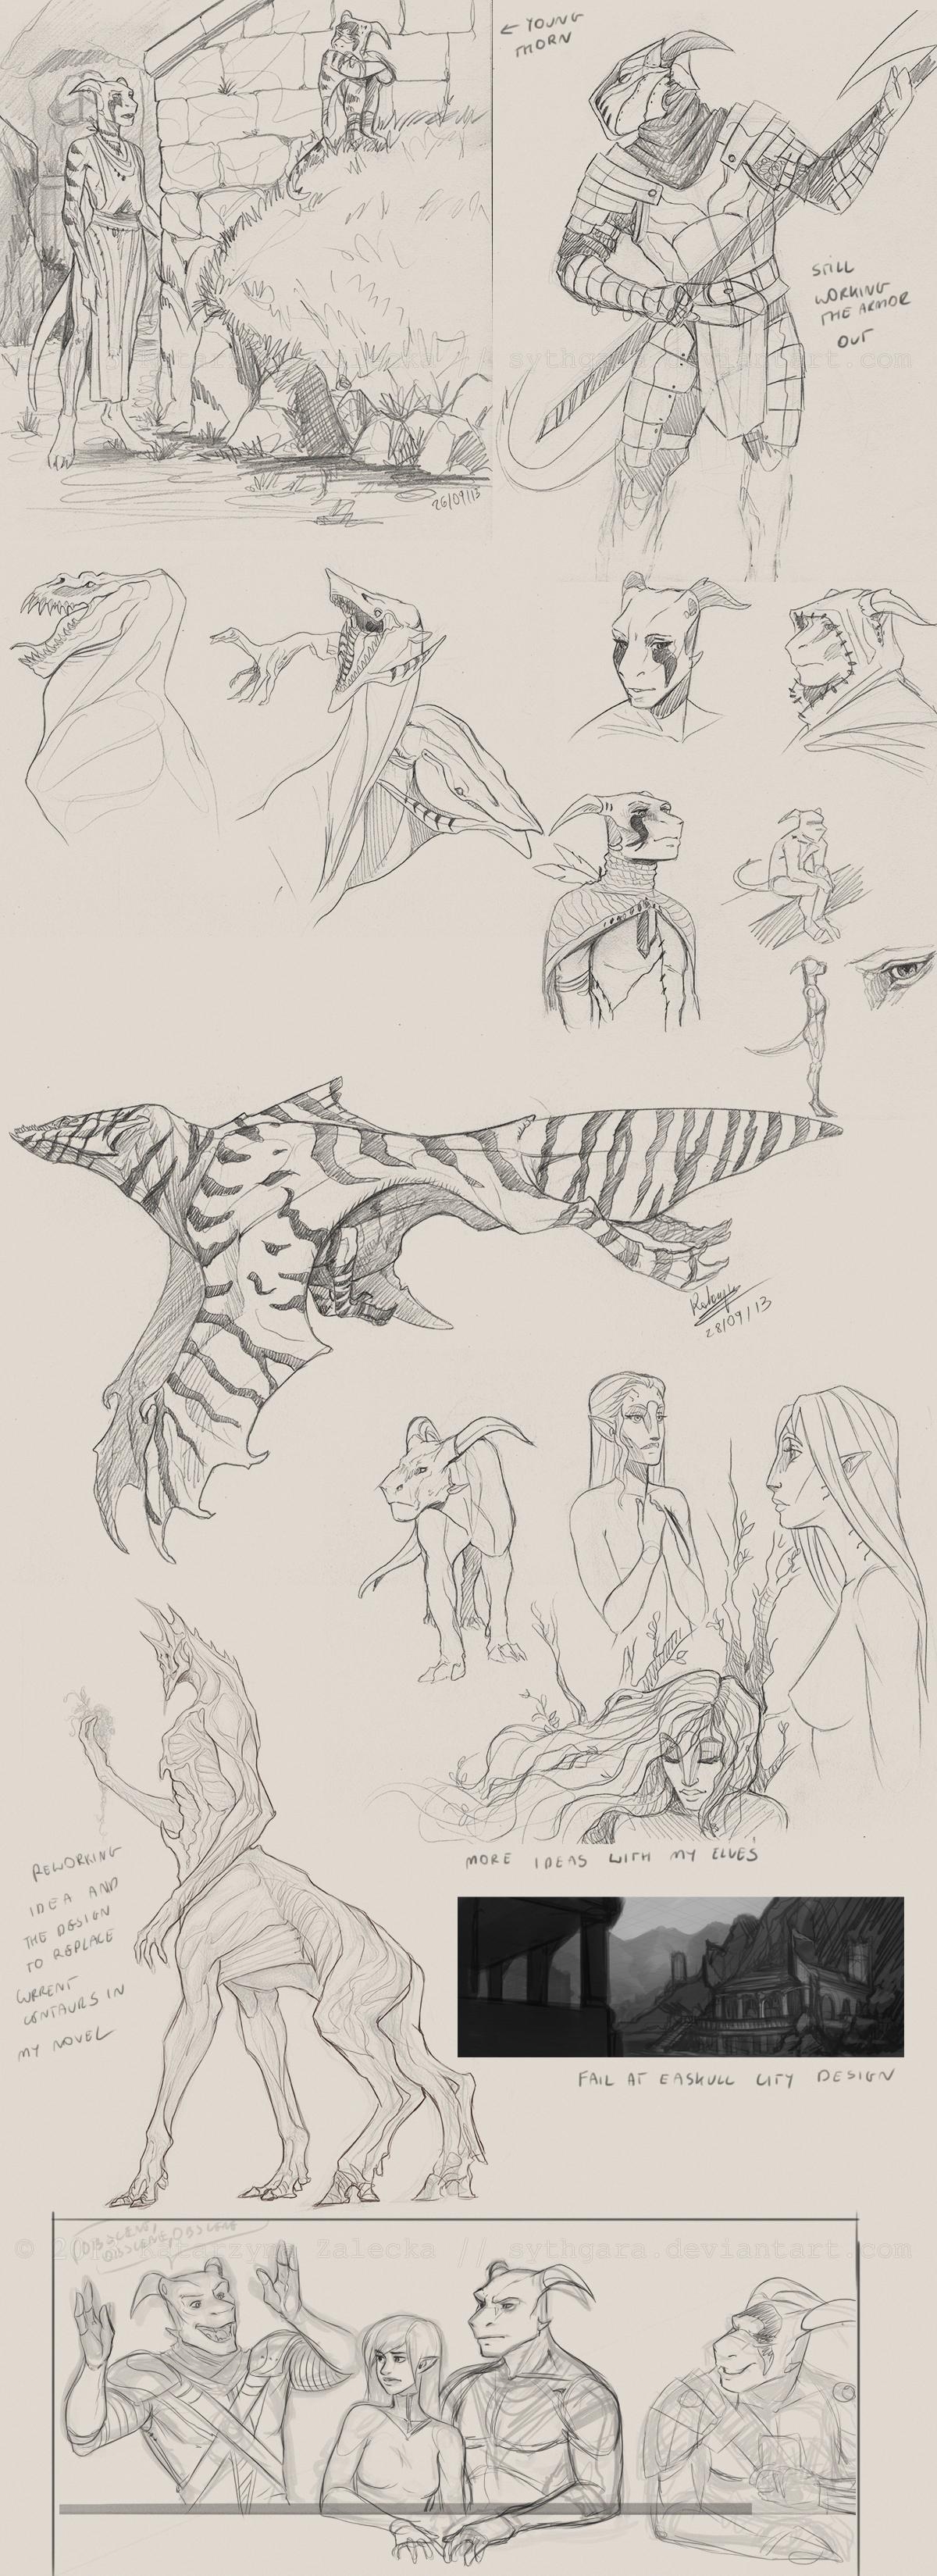 september 2013 sketchdump by Sythgara